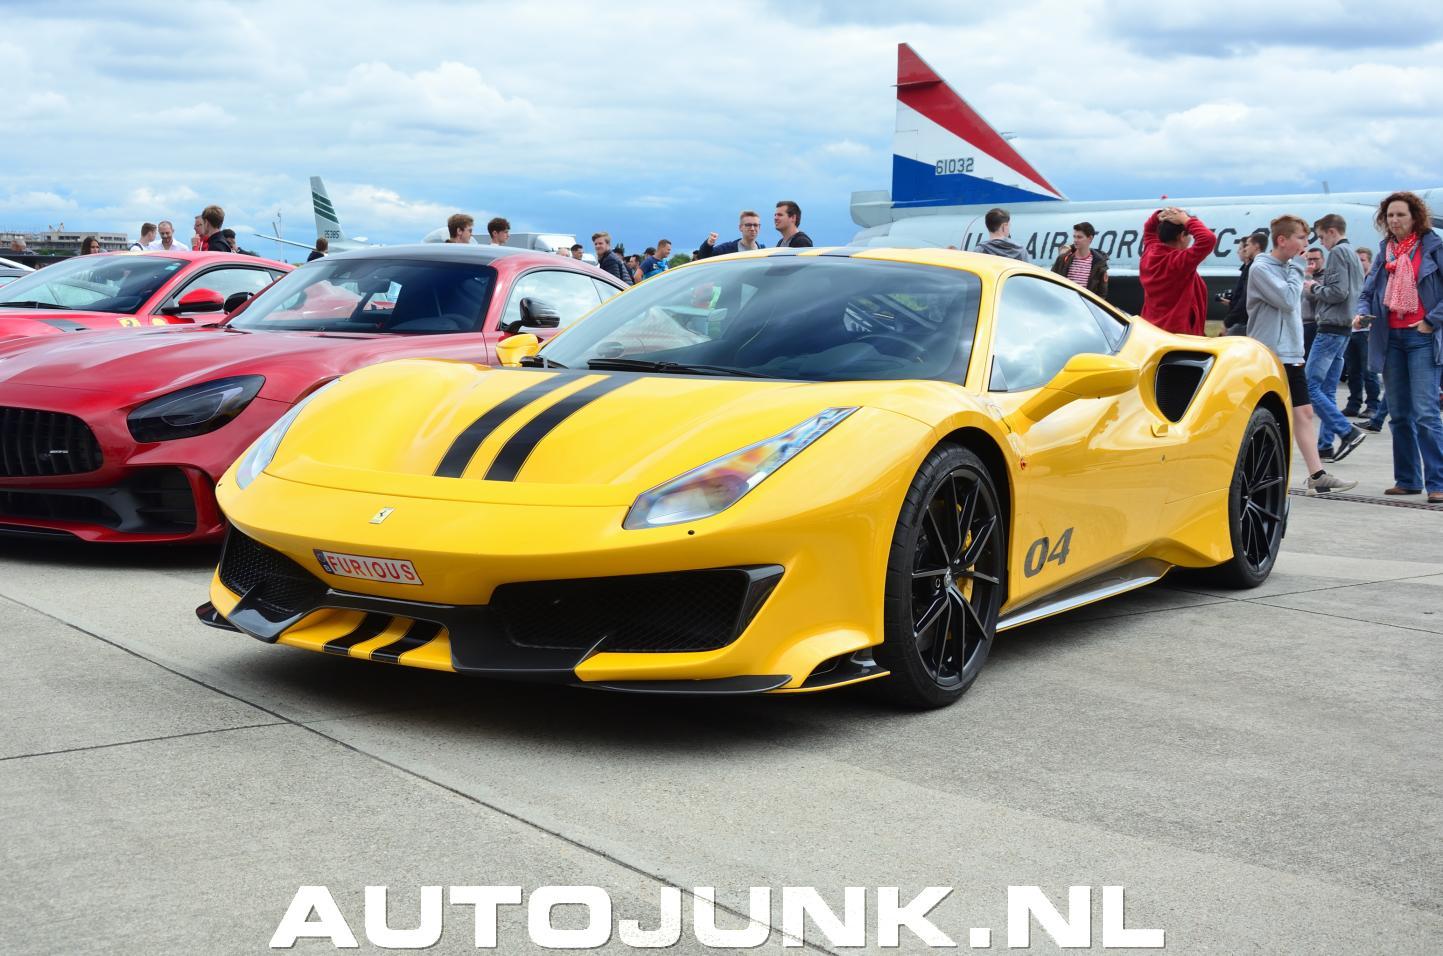 Ferrari 488 Pista Modena Yellow foto's » Autojunk.nl (243600)